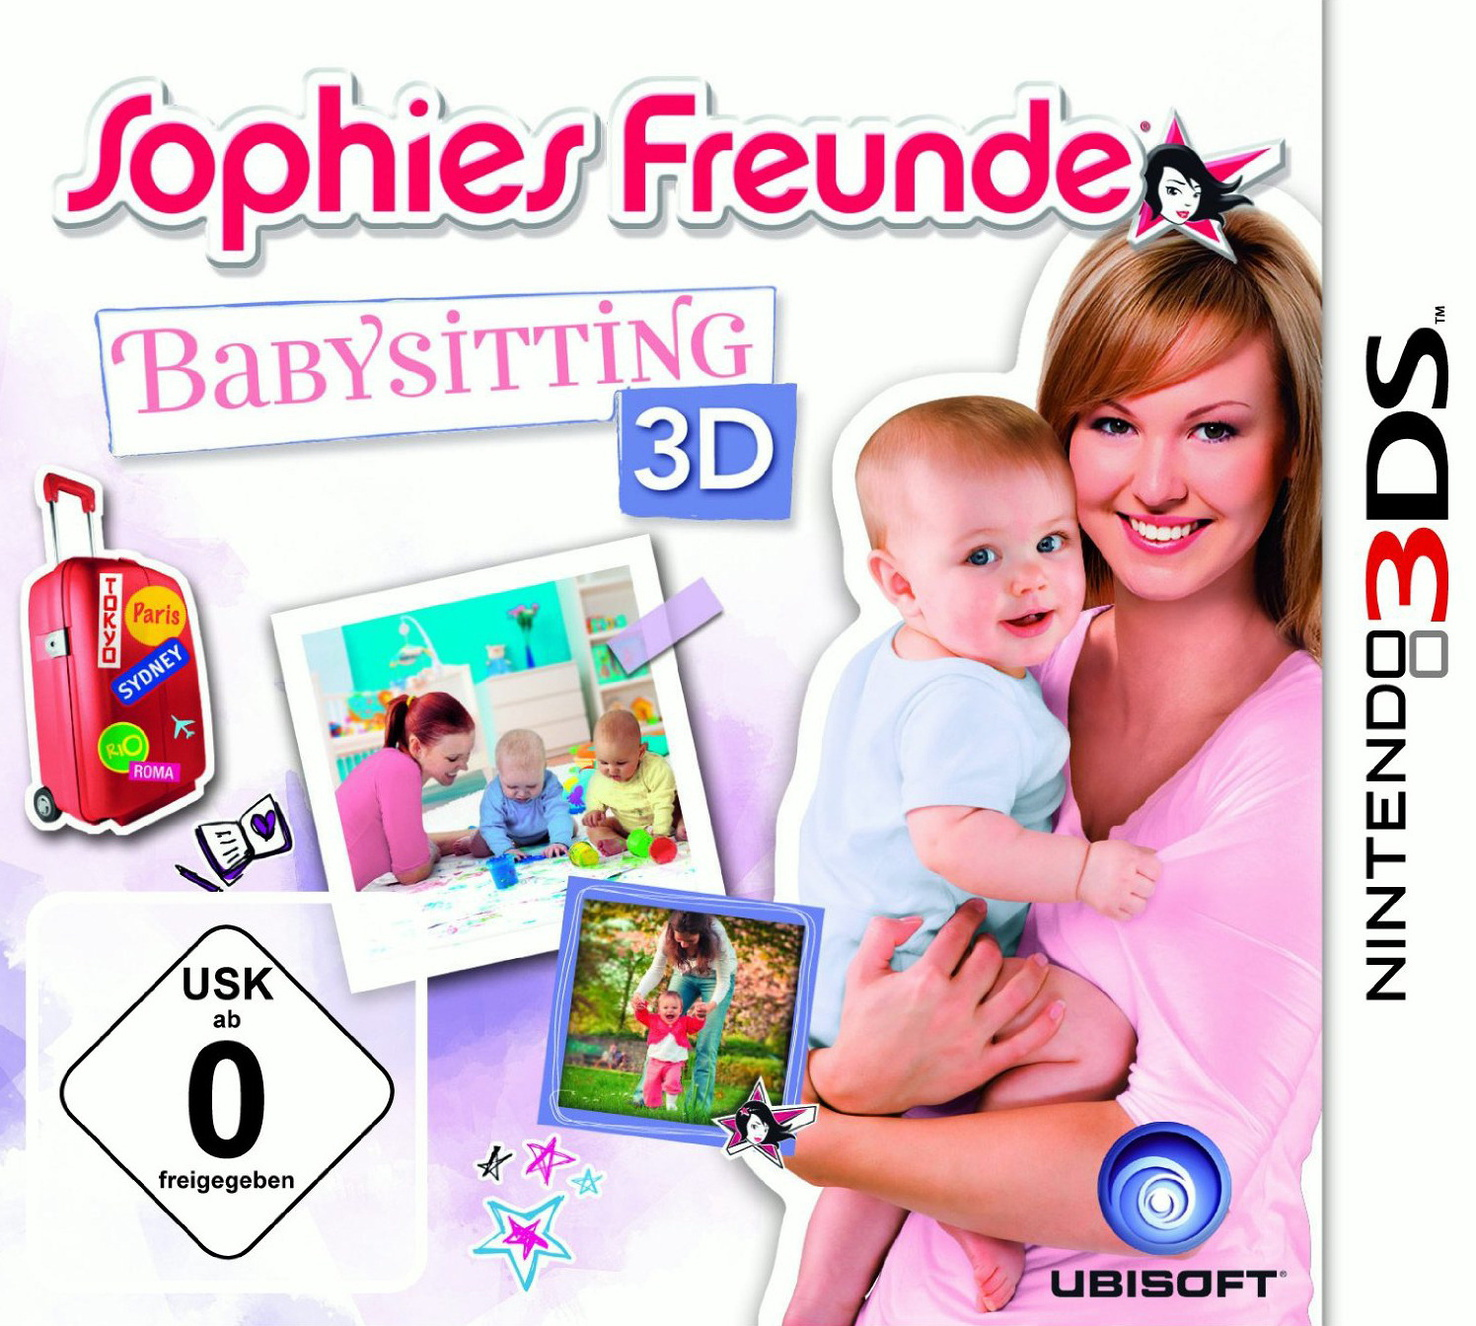 Sophies Freunde - Babysitting 3D [Software Pyramide]